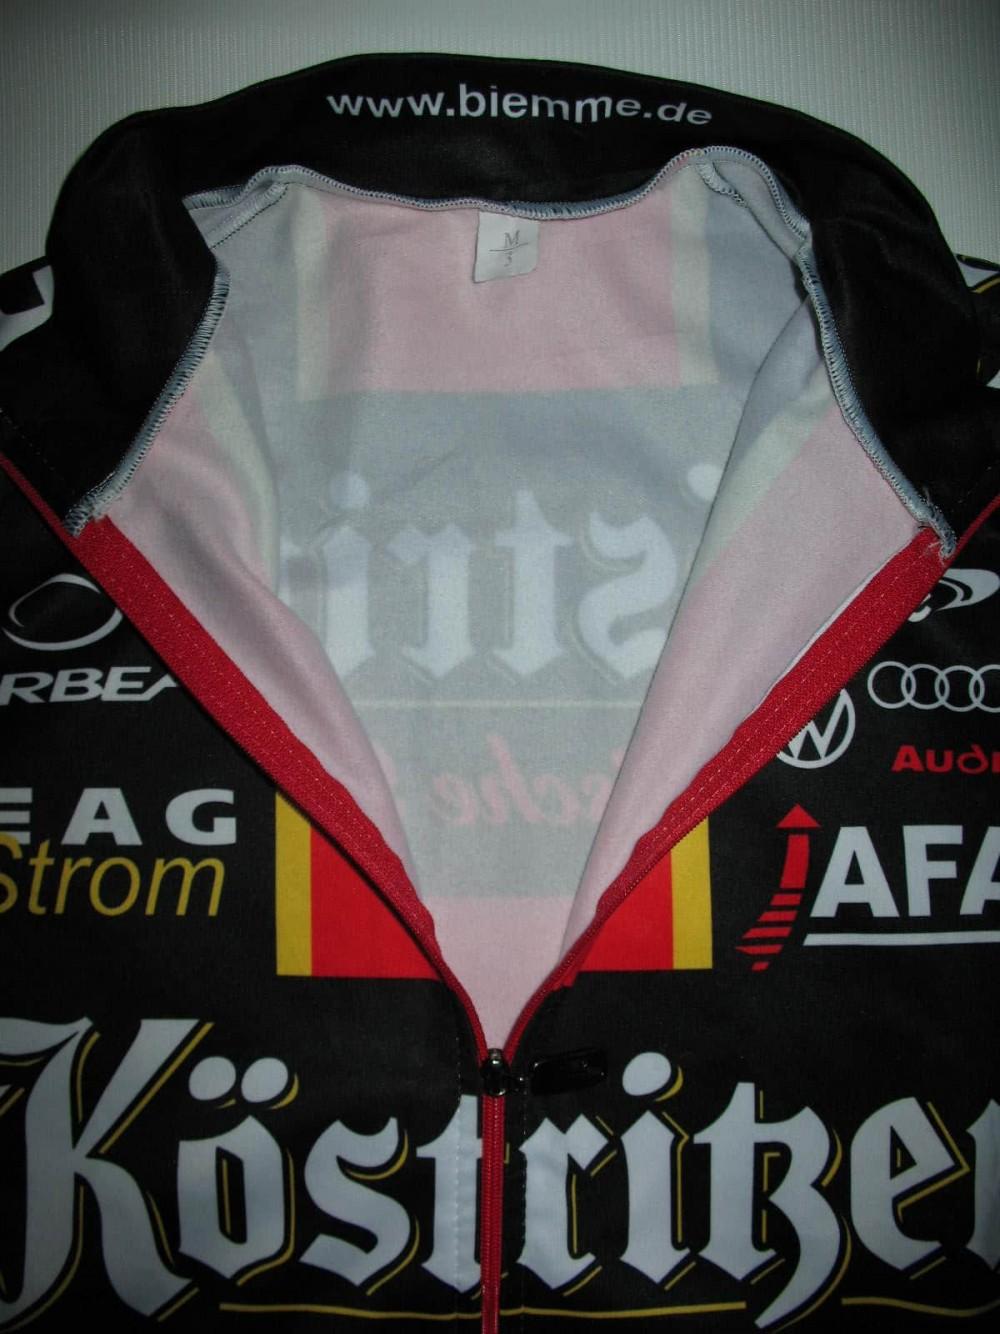 Велокофта BIEMME kostriser fleece cycling jacket (размер М) - 2